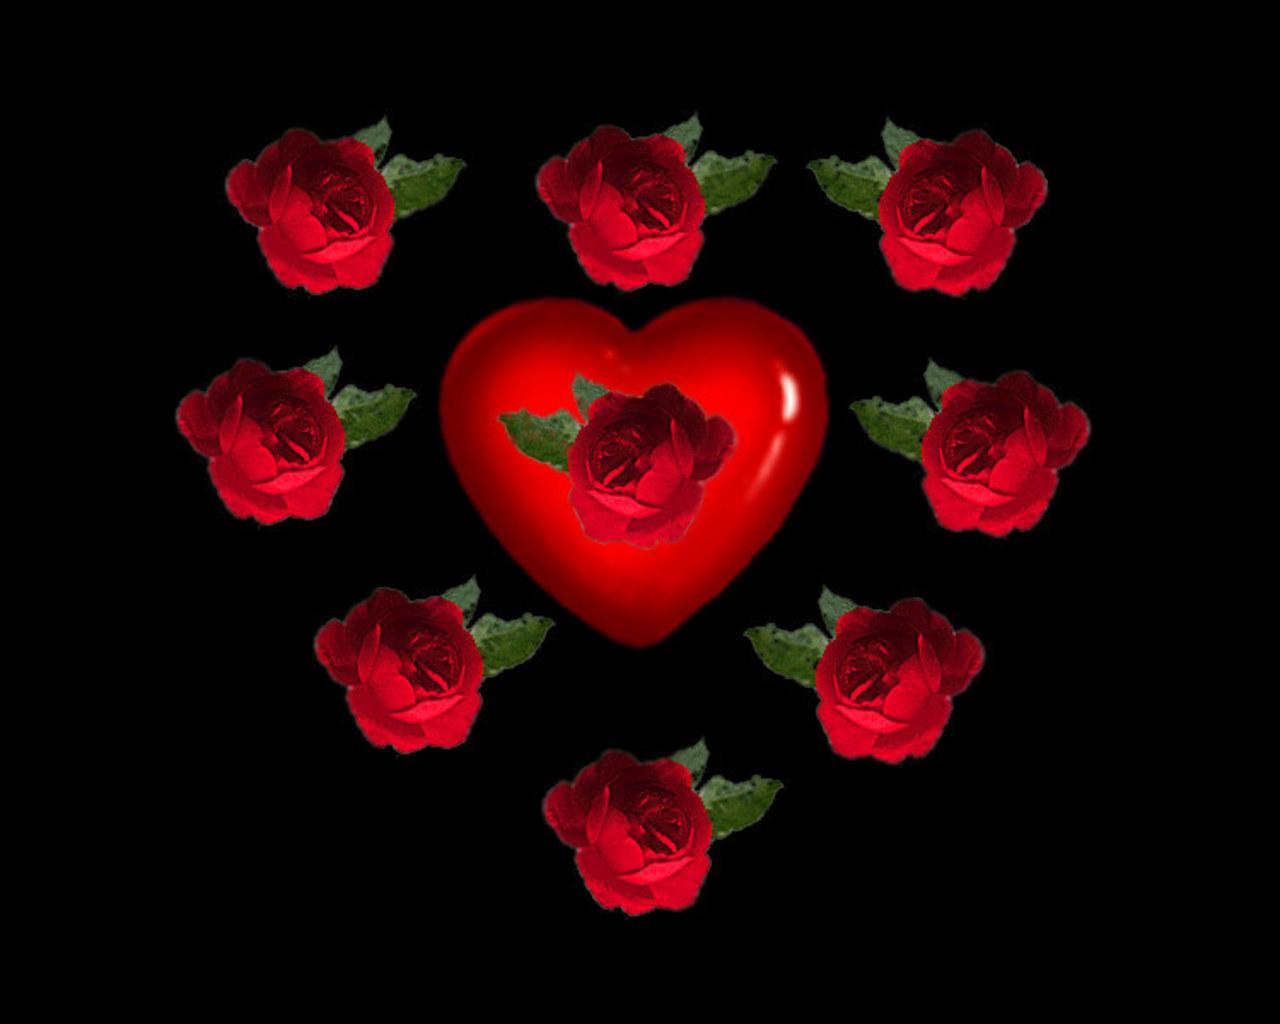 بالصور اجمل صور قلب , اجمد صور قلب 12254 11